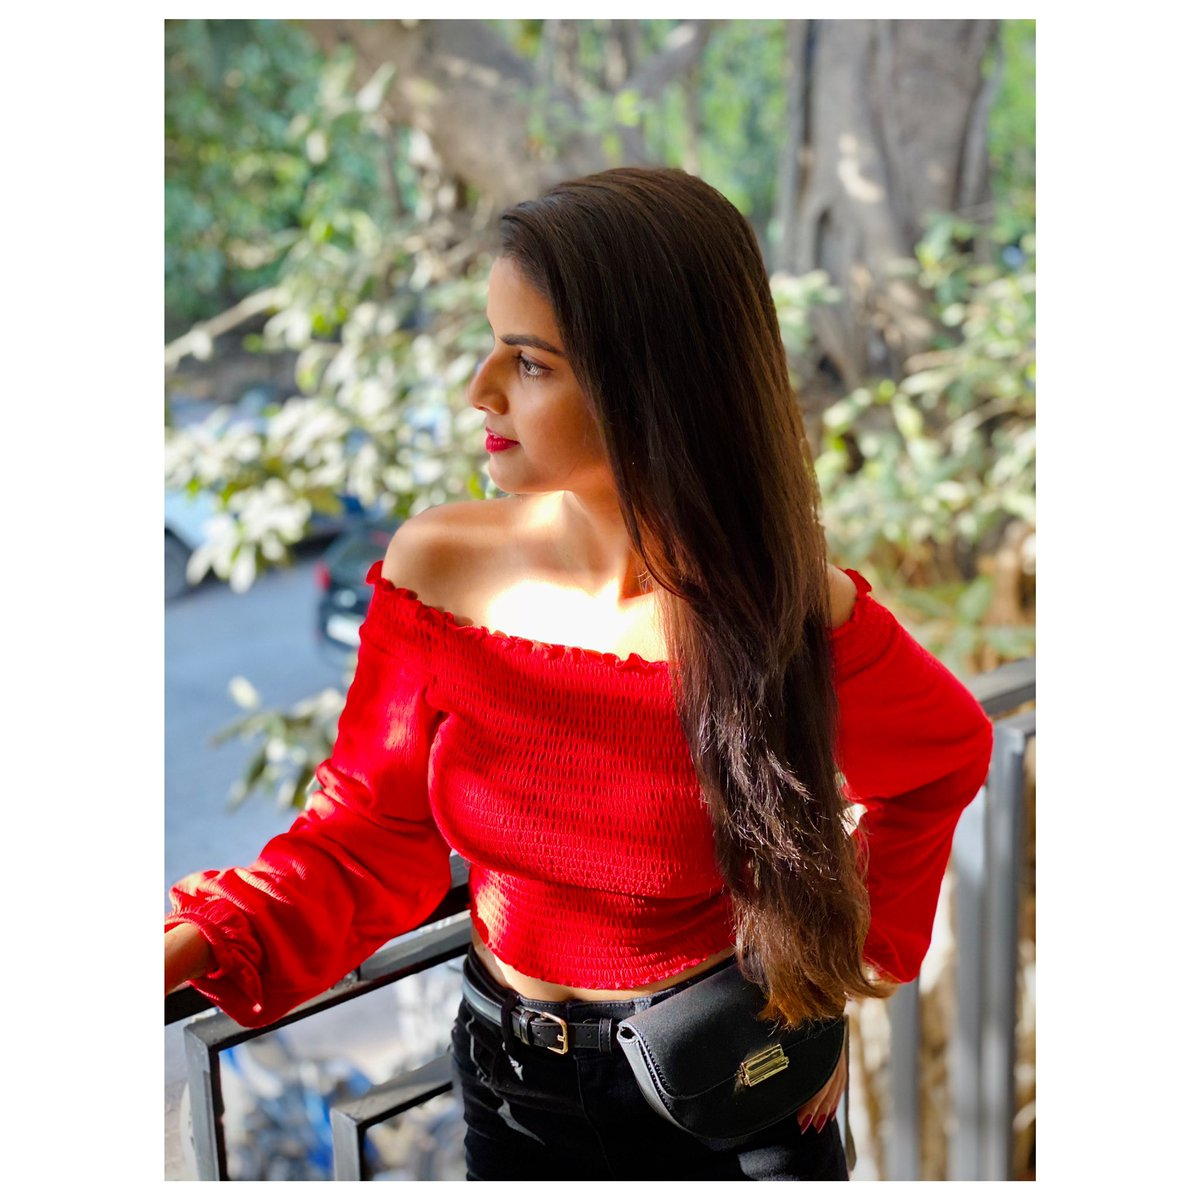 If it's still on your mind, It is worth taking the risk....!!  . . : @soul_kari  . . . . . . .  #redlip #bosswoman #mood #portraits #portraitphotography #photooftheday #lifestyle #picoftheday #saturdaymood #lifeisgood #eyeseeyou #singersongwriter #rituagarwal #voiceofritupic.twitter.com/q83cMGpk0e